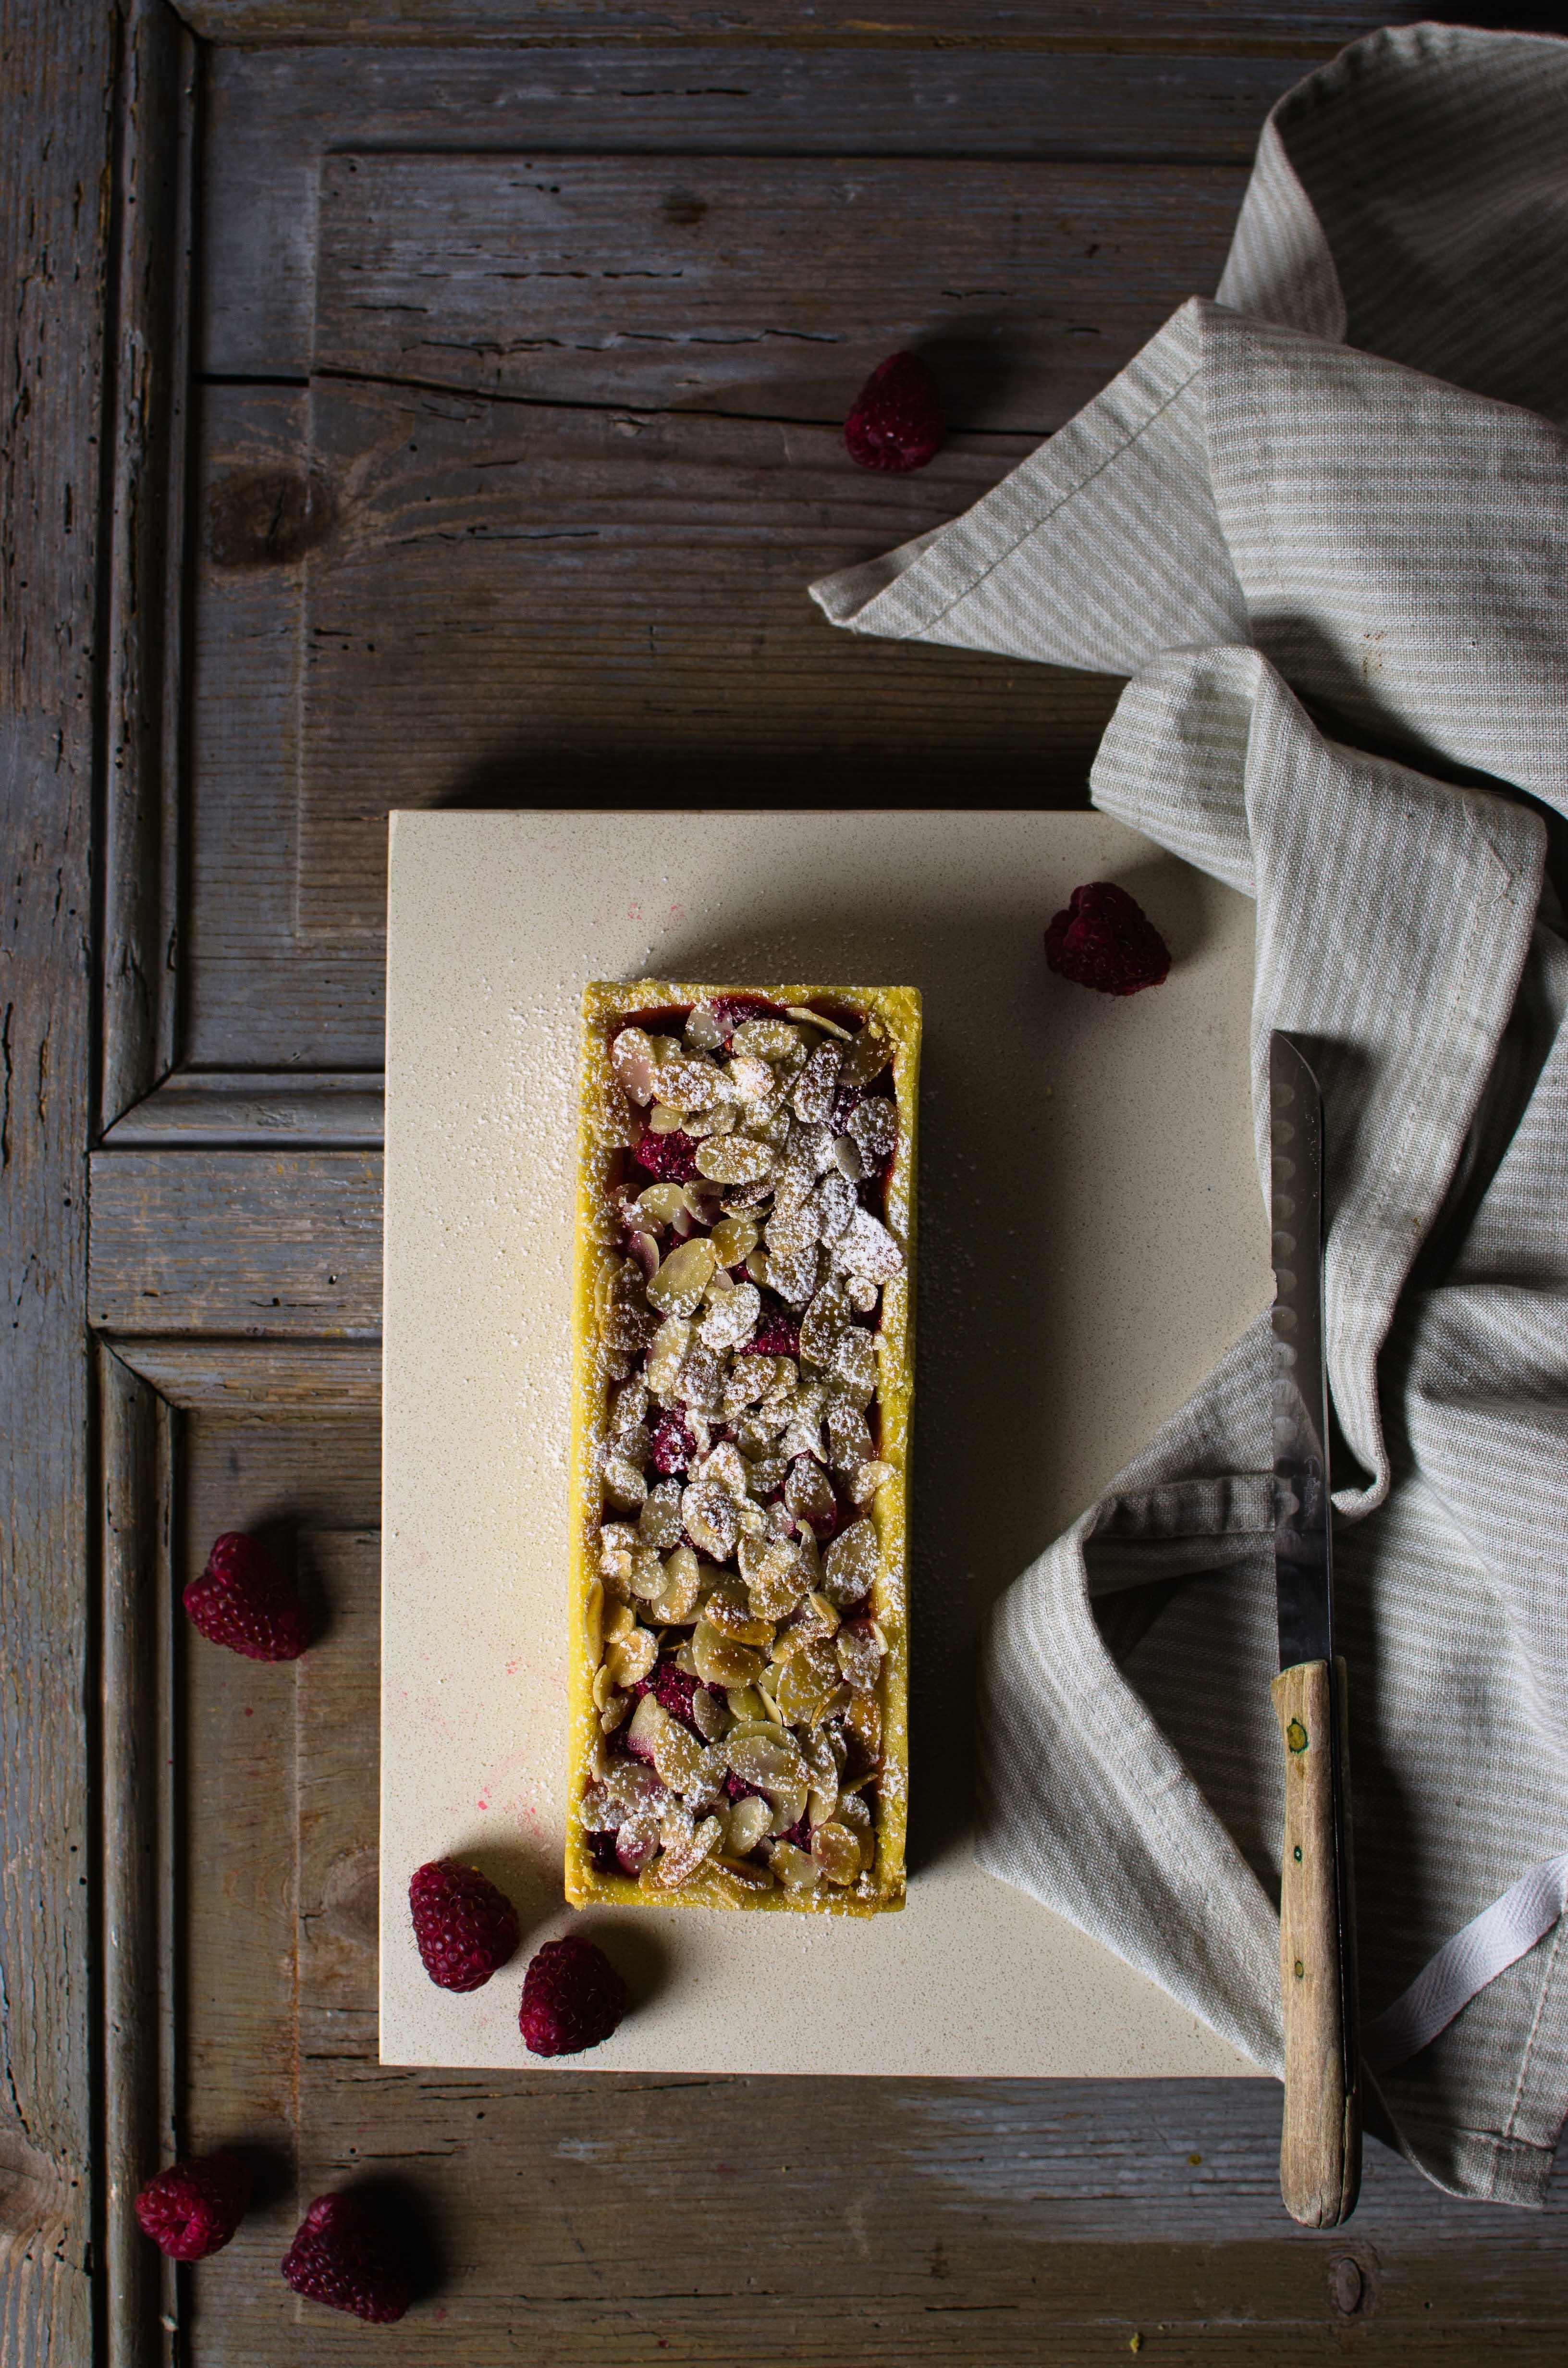 Tarte-rabarbaro-lamponi-fragole Tarte al rabarbaro, fragole e lamponi di Yann Couvreur